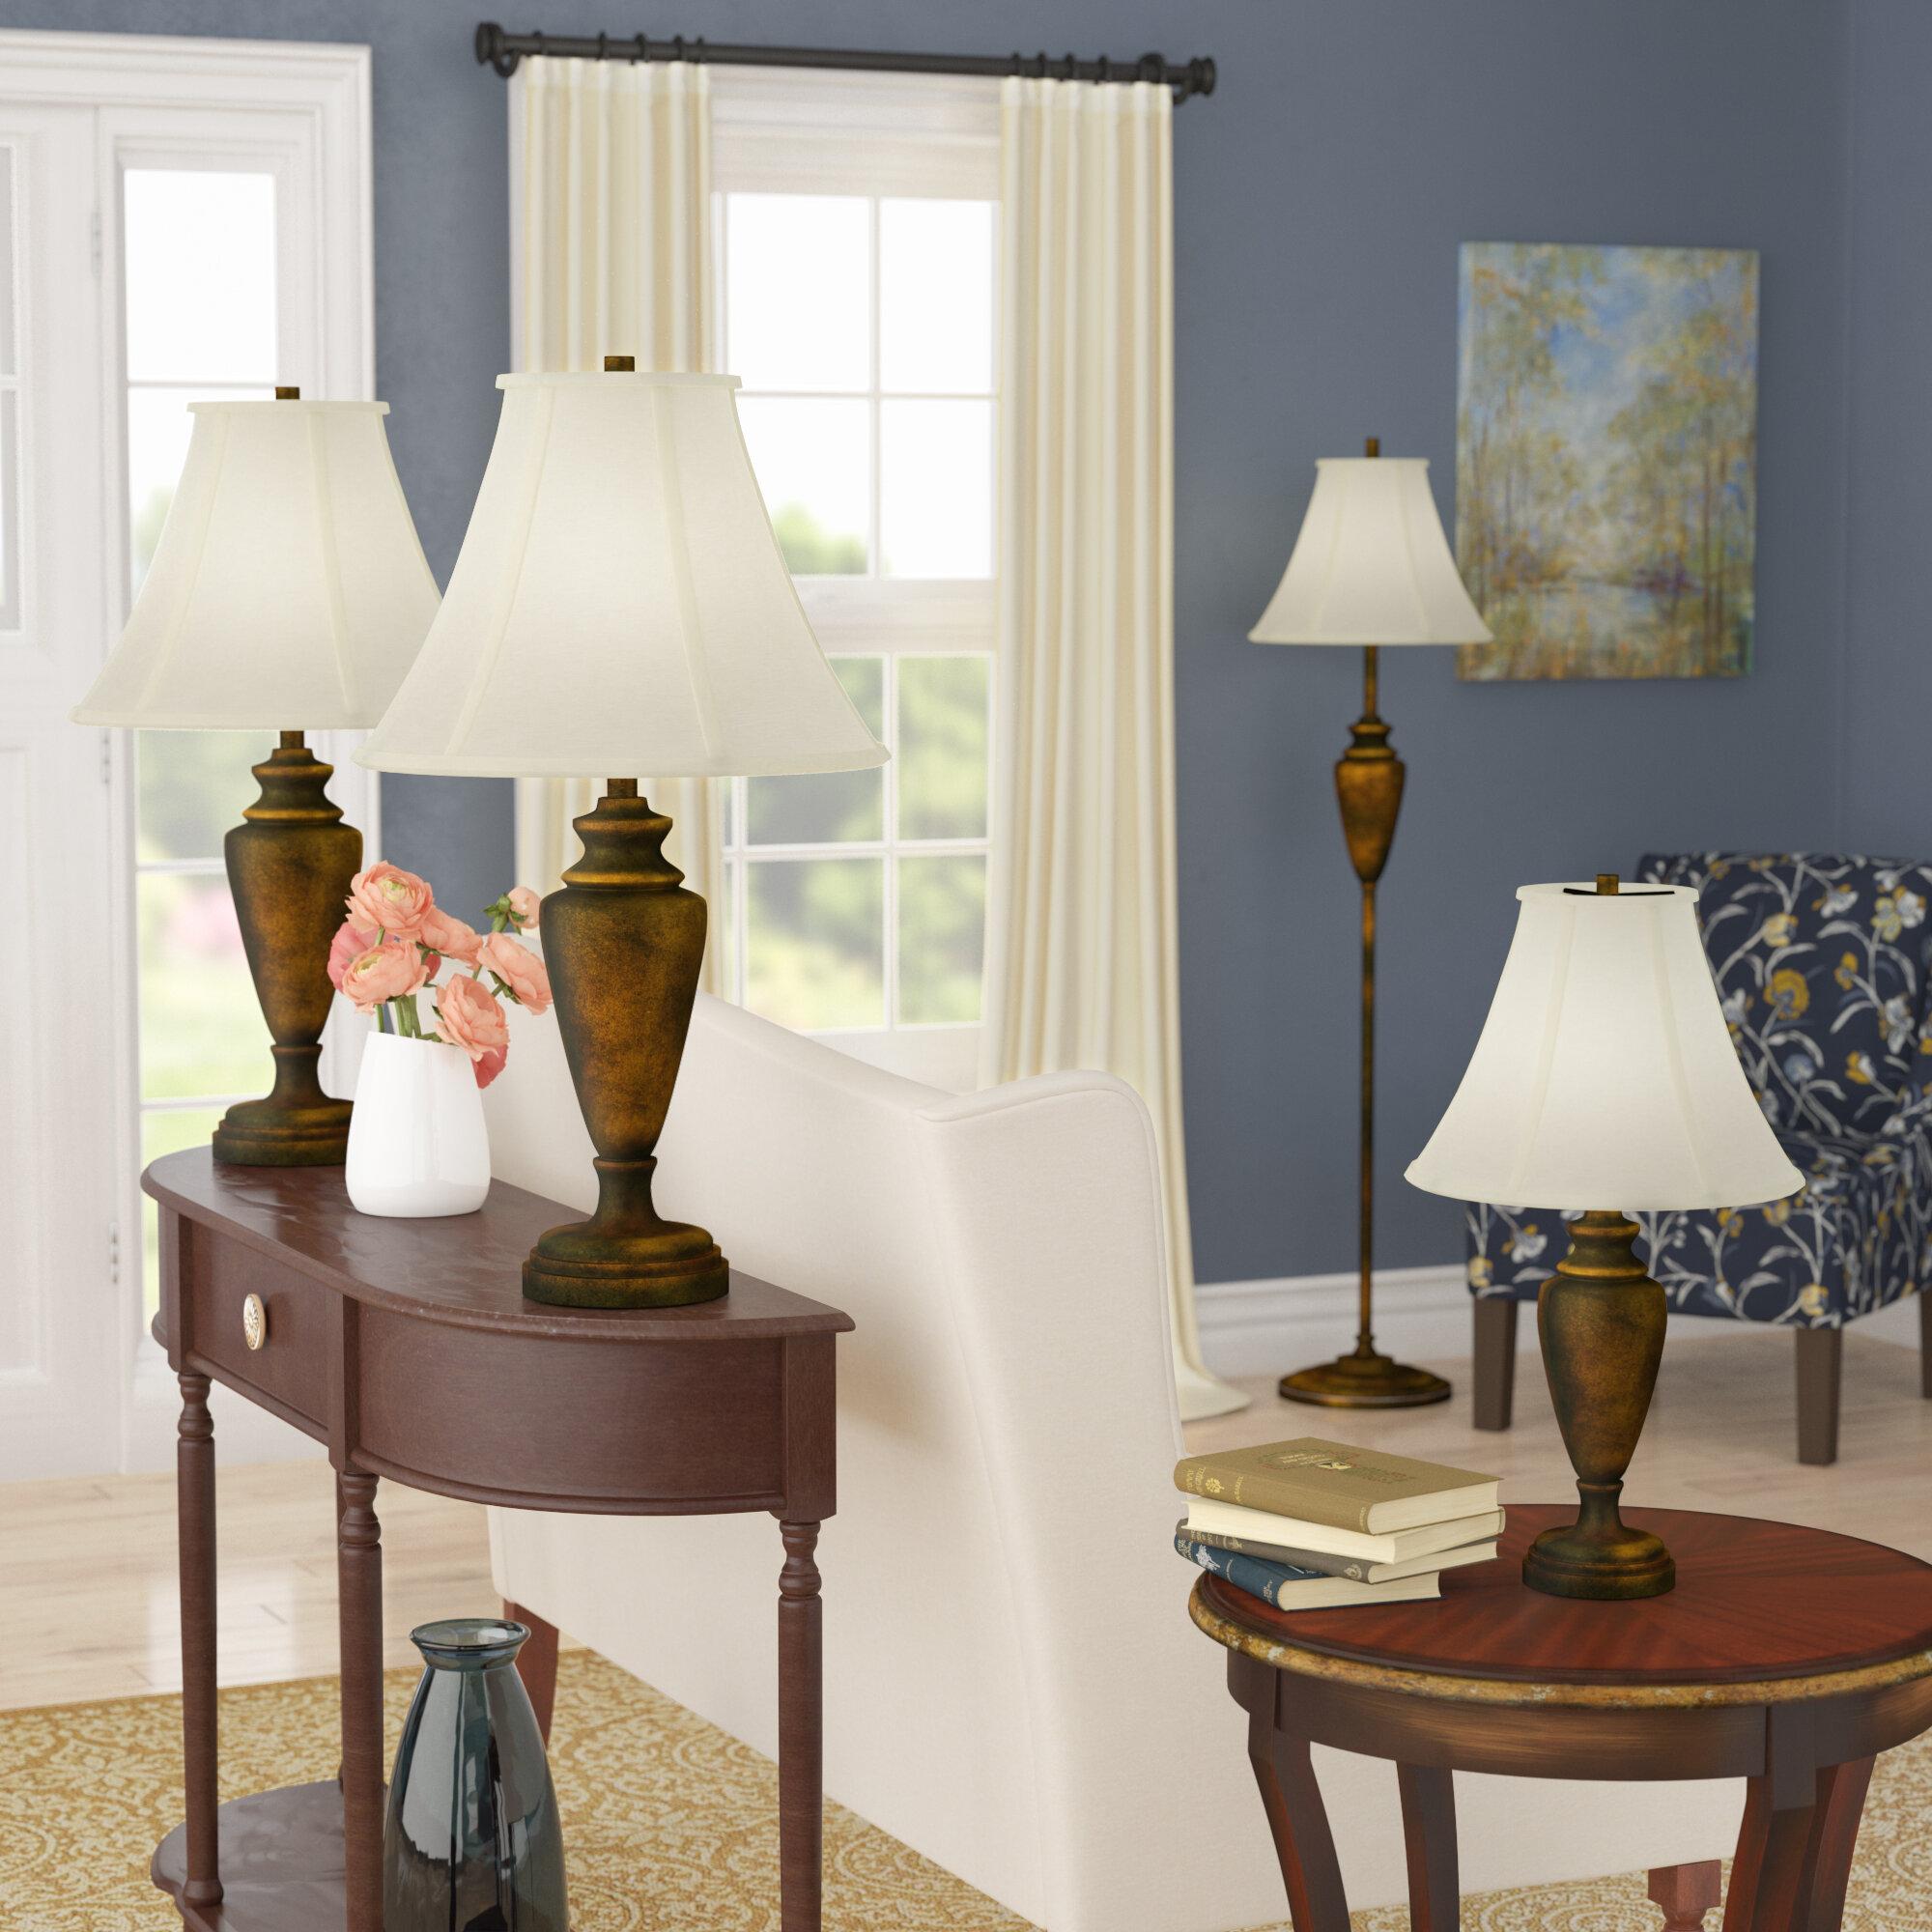 & Alcott Hill Paulson 4 Piece Table and Floor Lamp Set u0026 Reviews | Wayfair